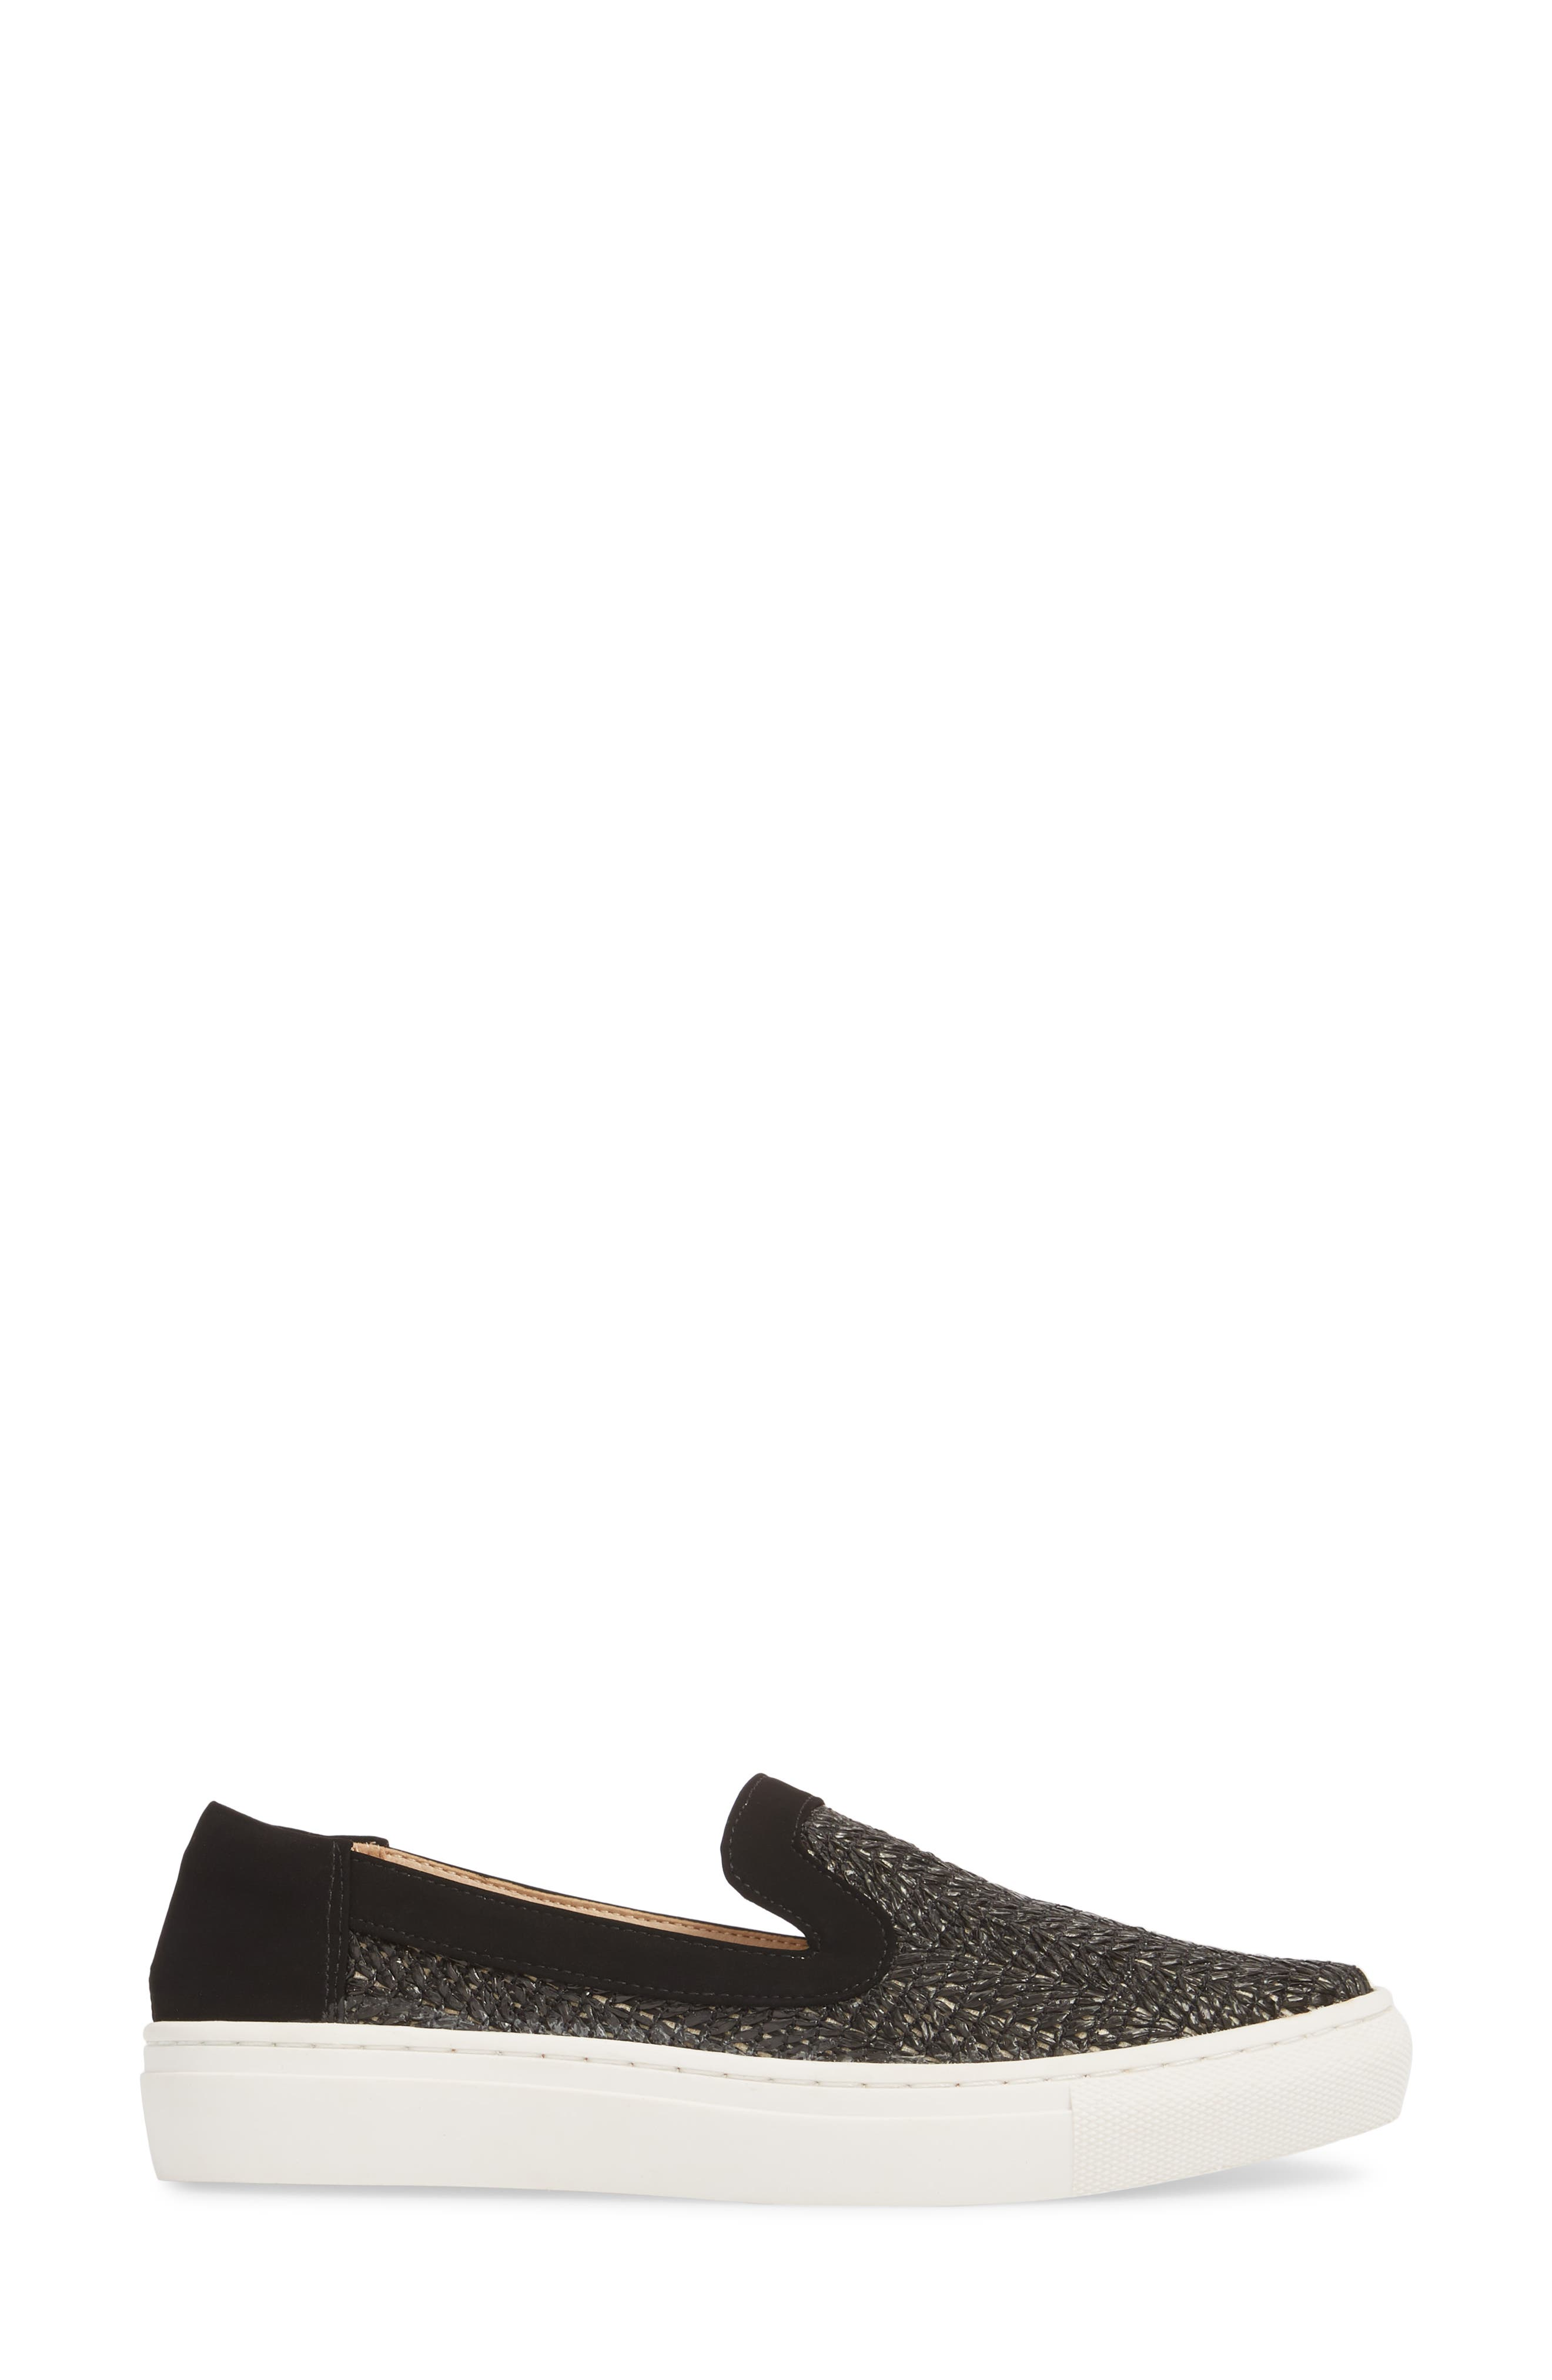 Lineth Sneaker,                             Alternate thumbnail 3, color,                             001